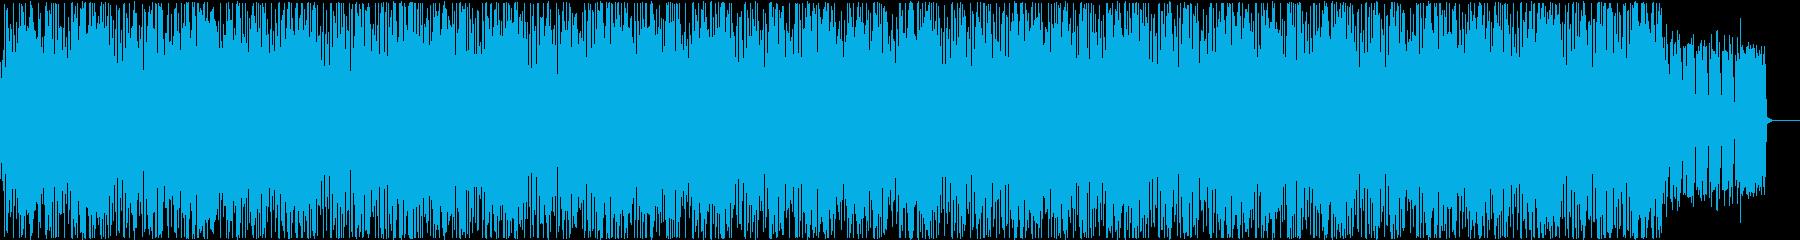 CM、企業VPFuture Bass dの再生済みの波形